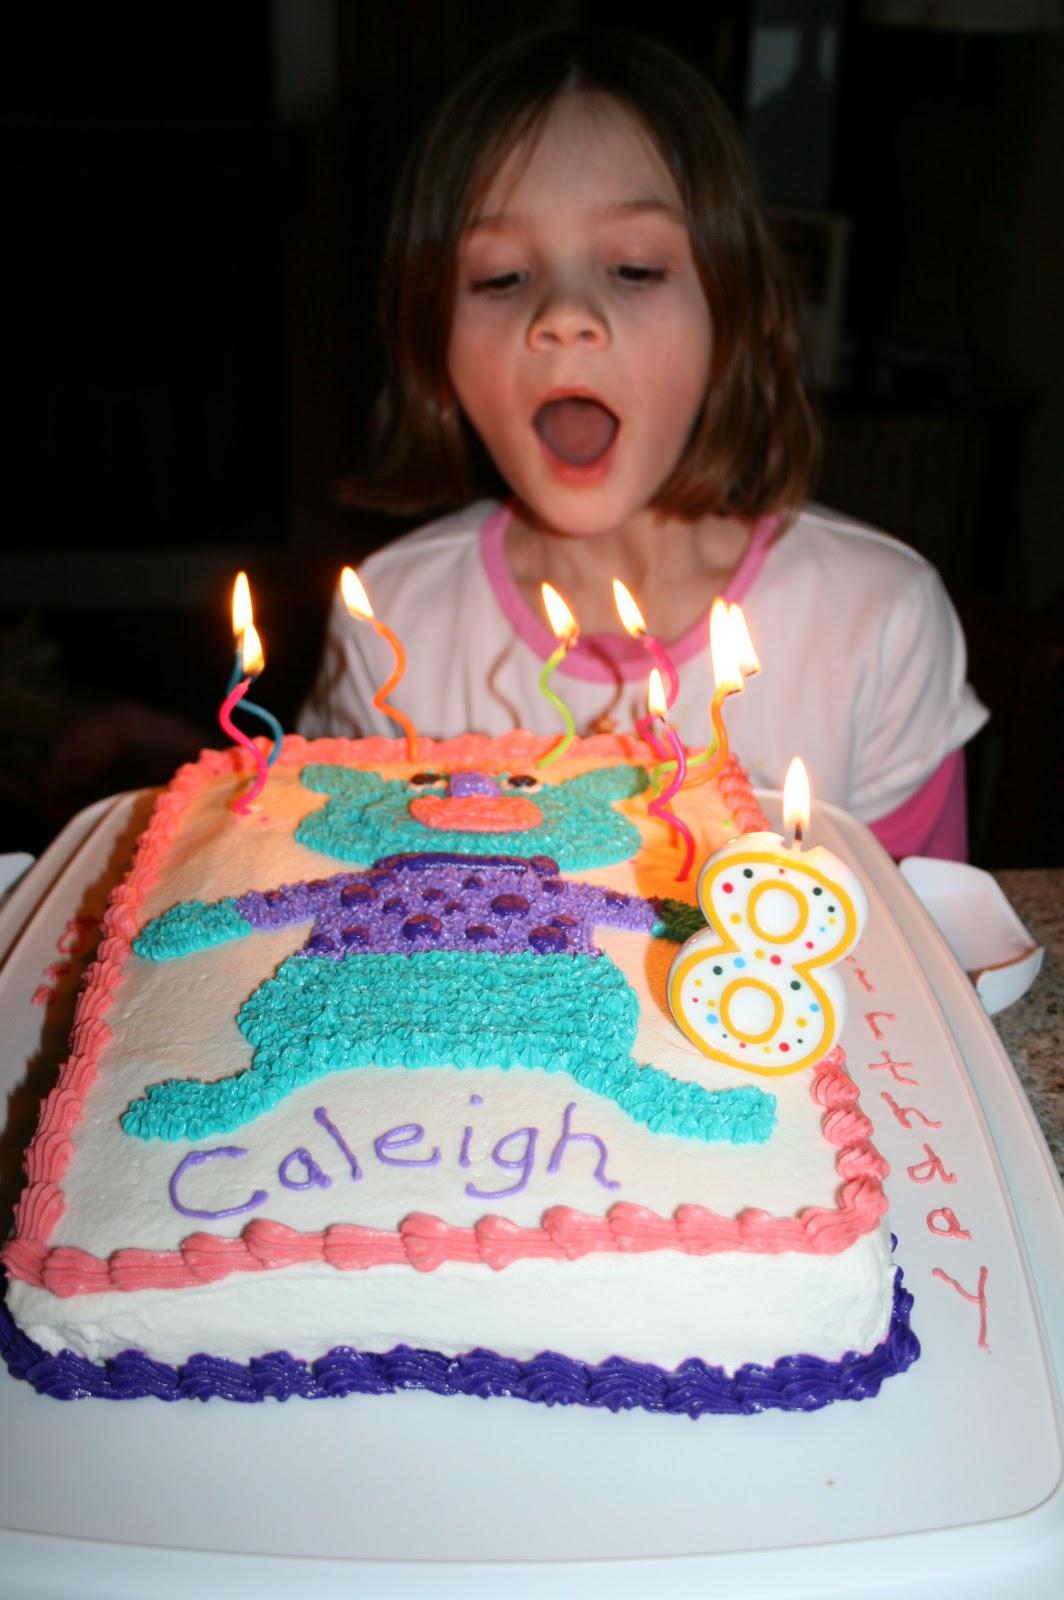 Adventures in Homeschooling: Caleigh's 8th Birthday (1064 x 1600 Pixel)